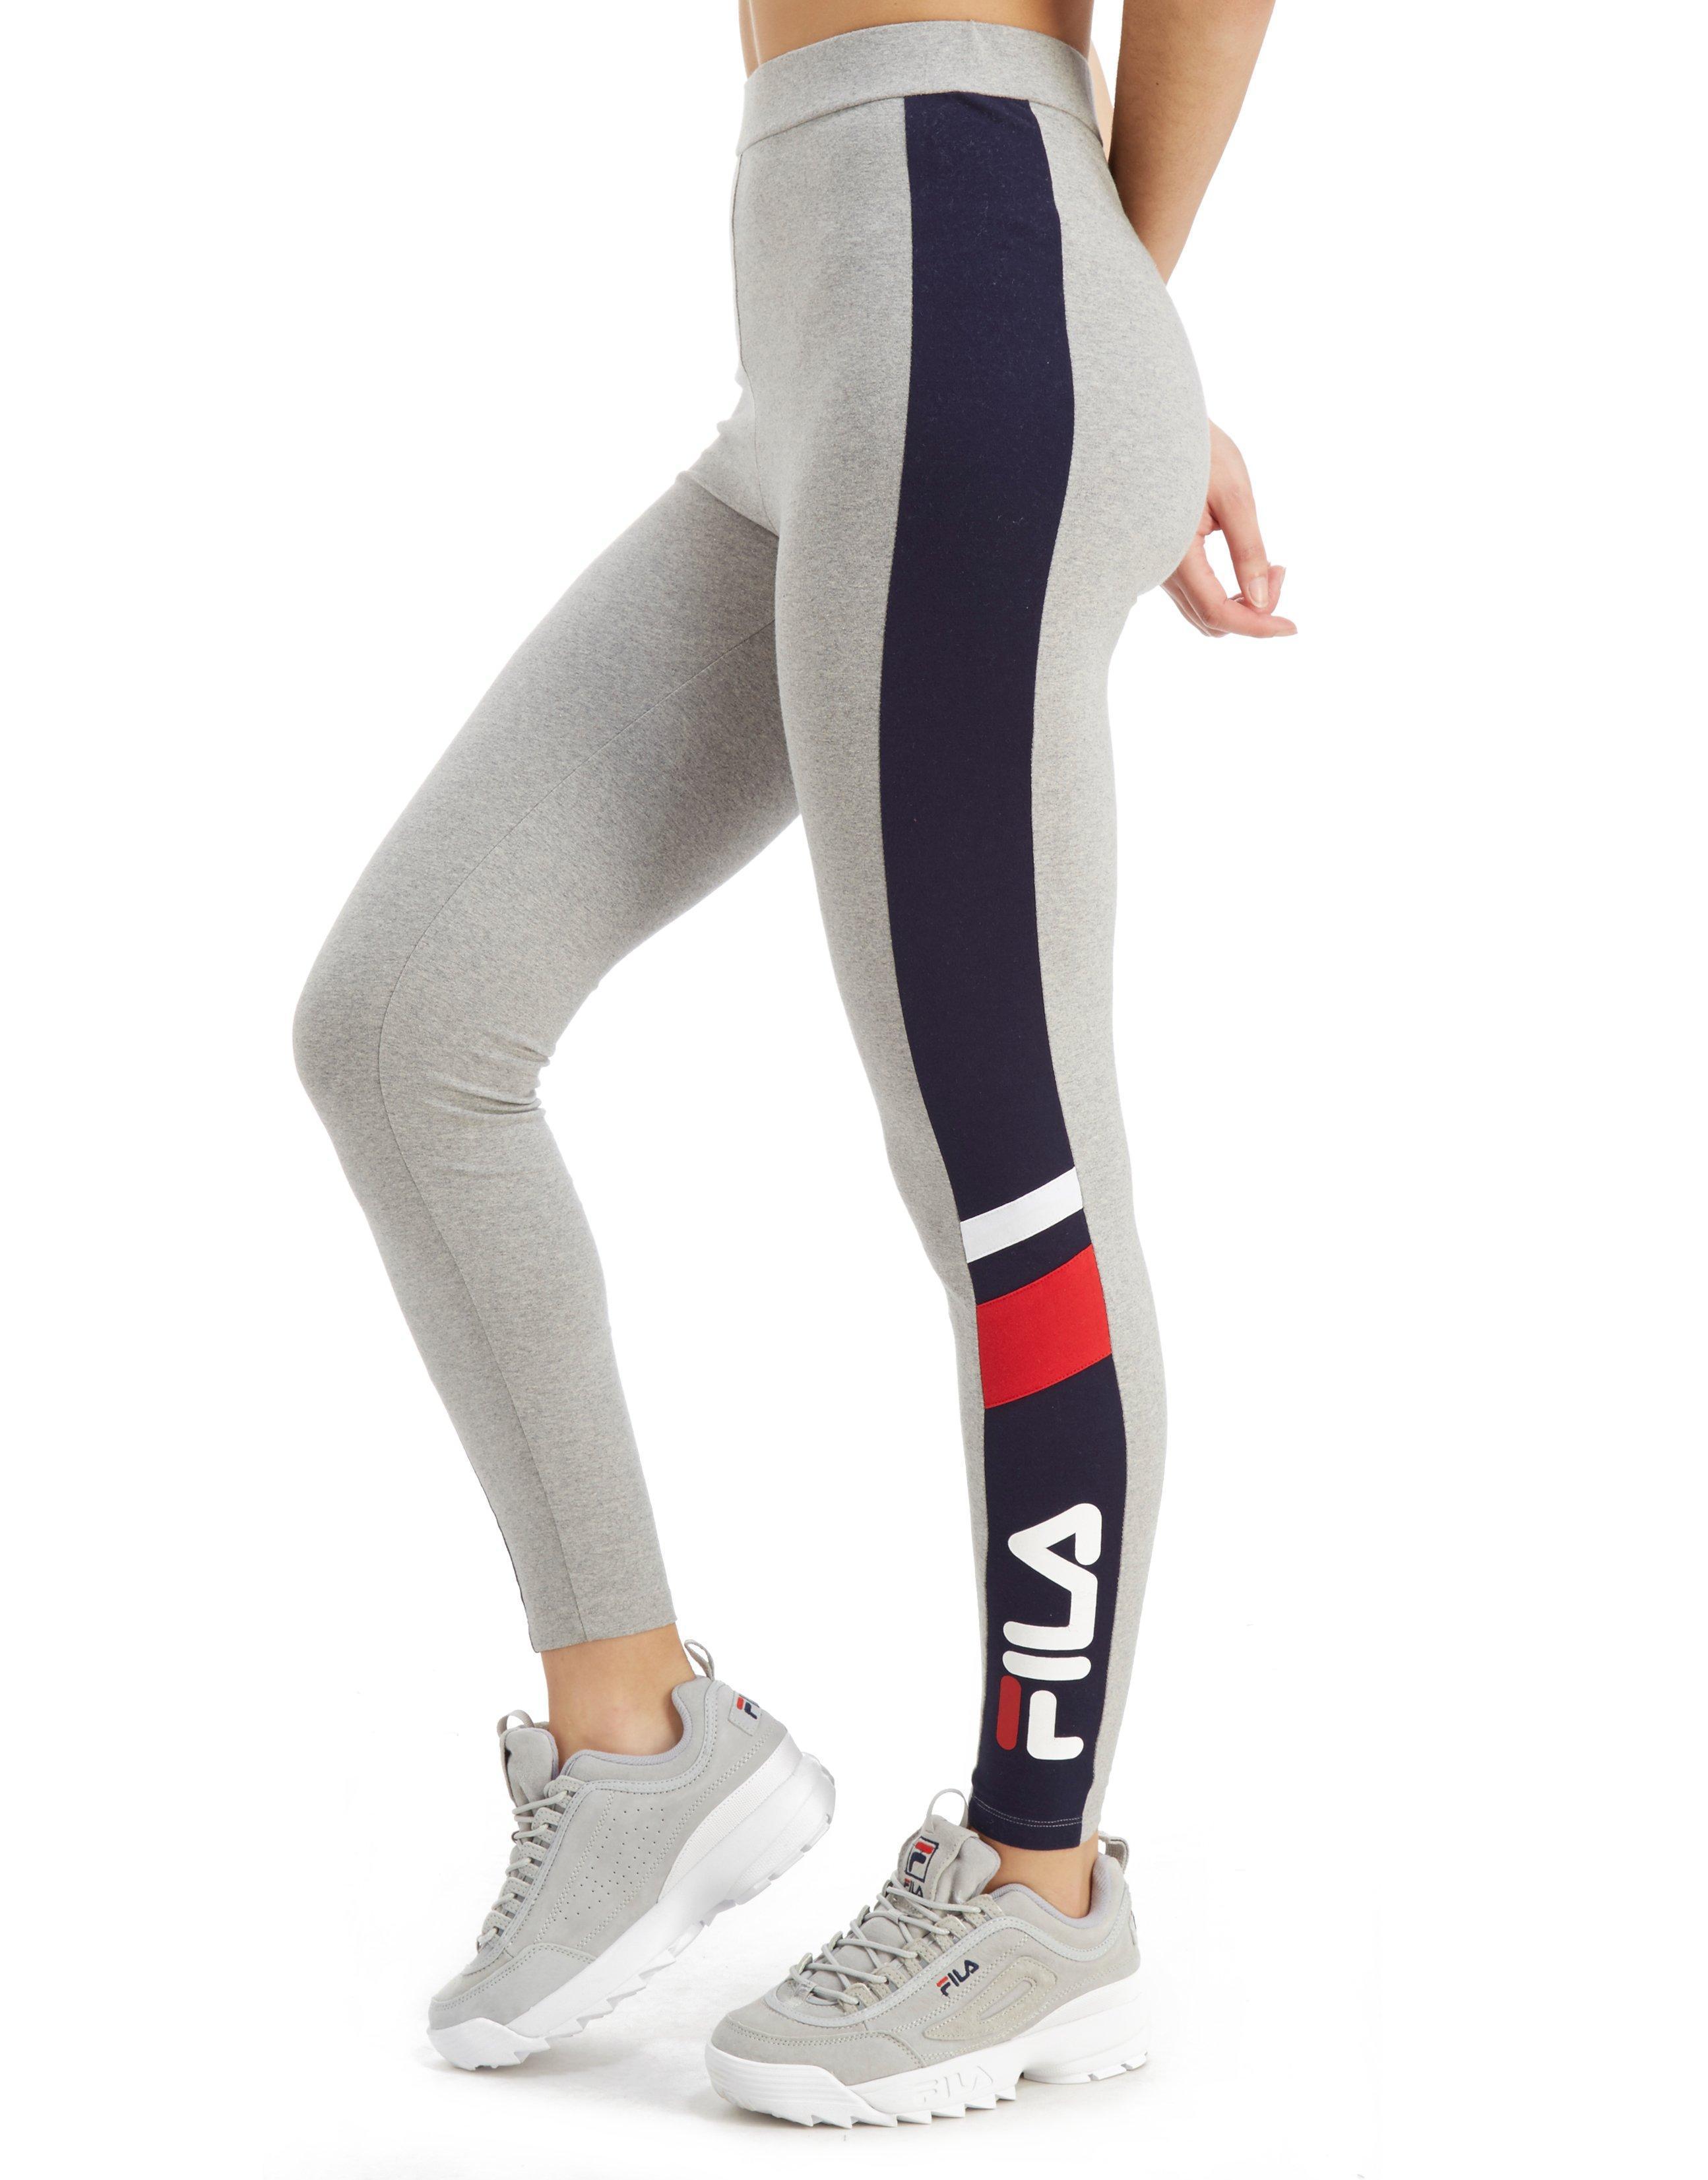 b14b1a0fe4dde Fila Panel Logo Leggings in Gray - Lyst